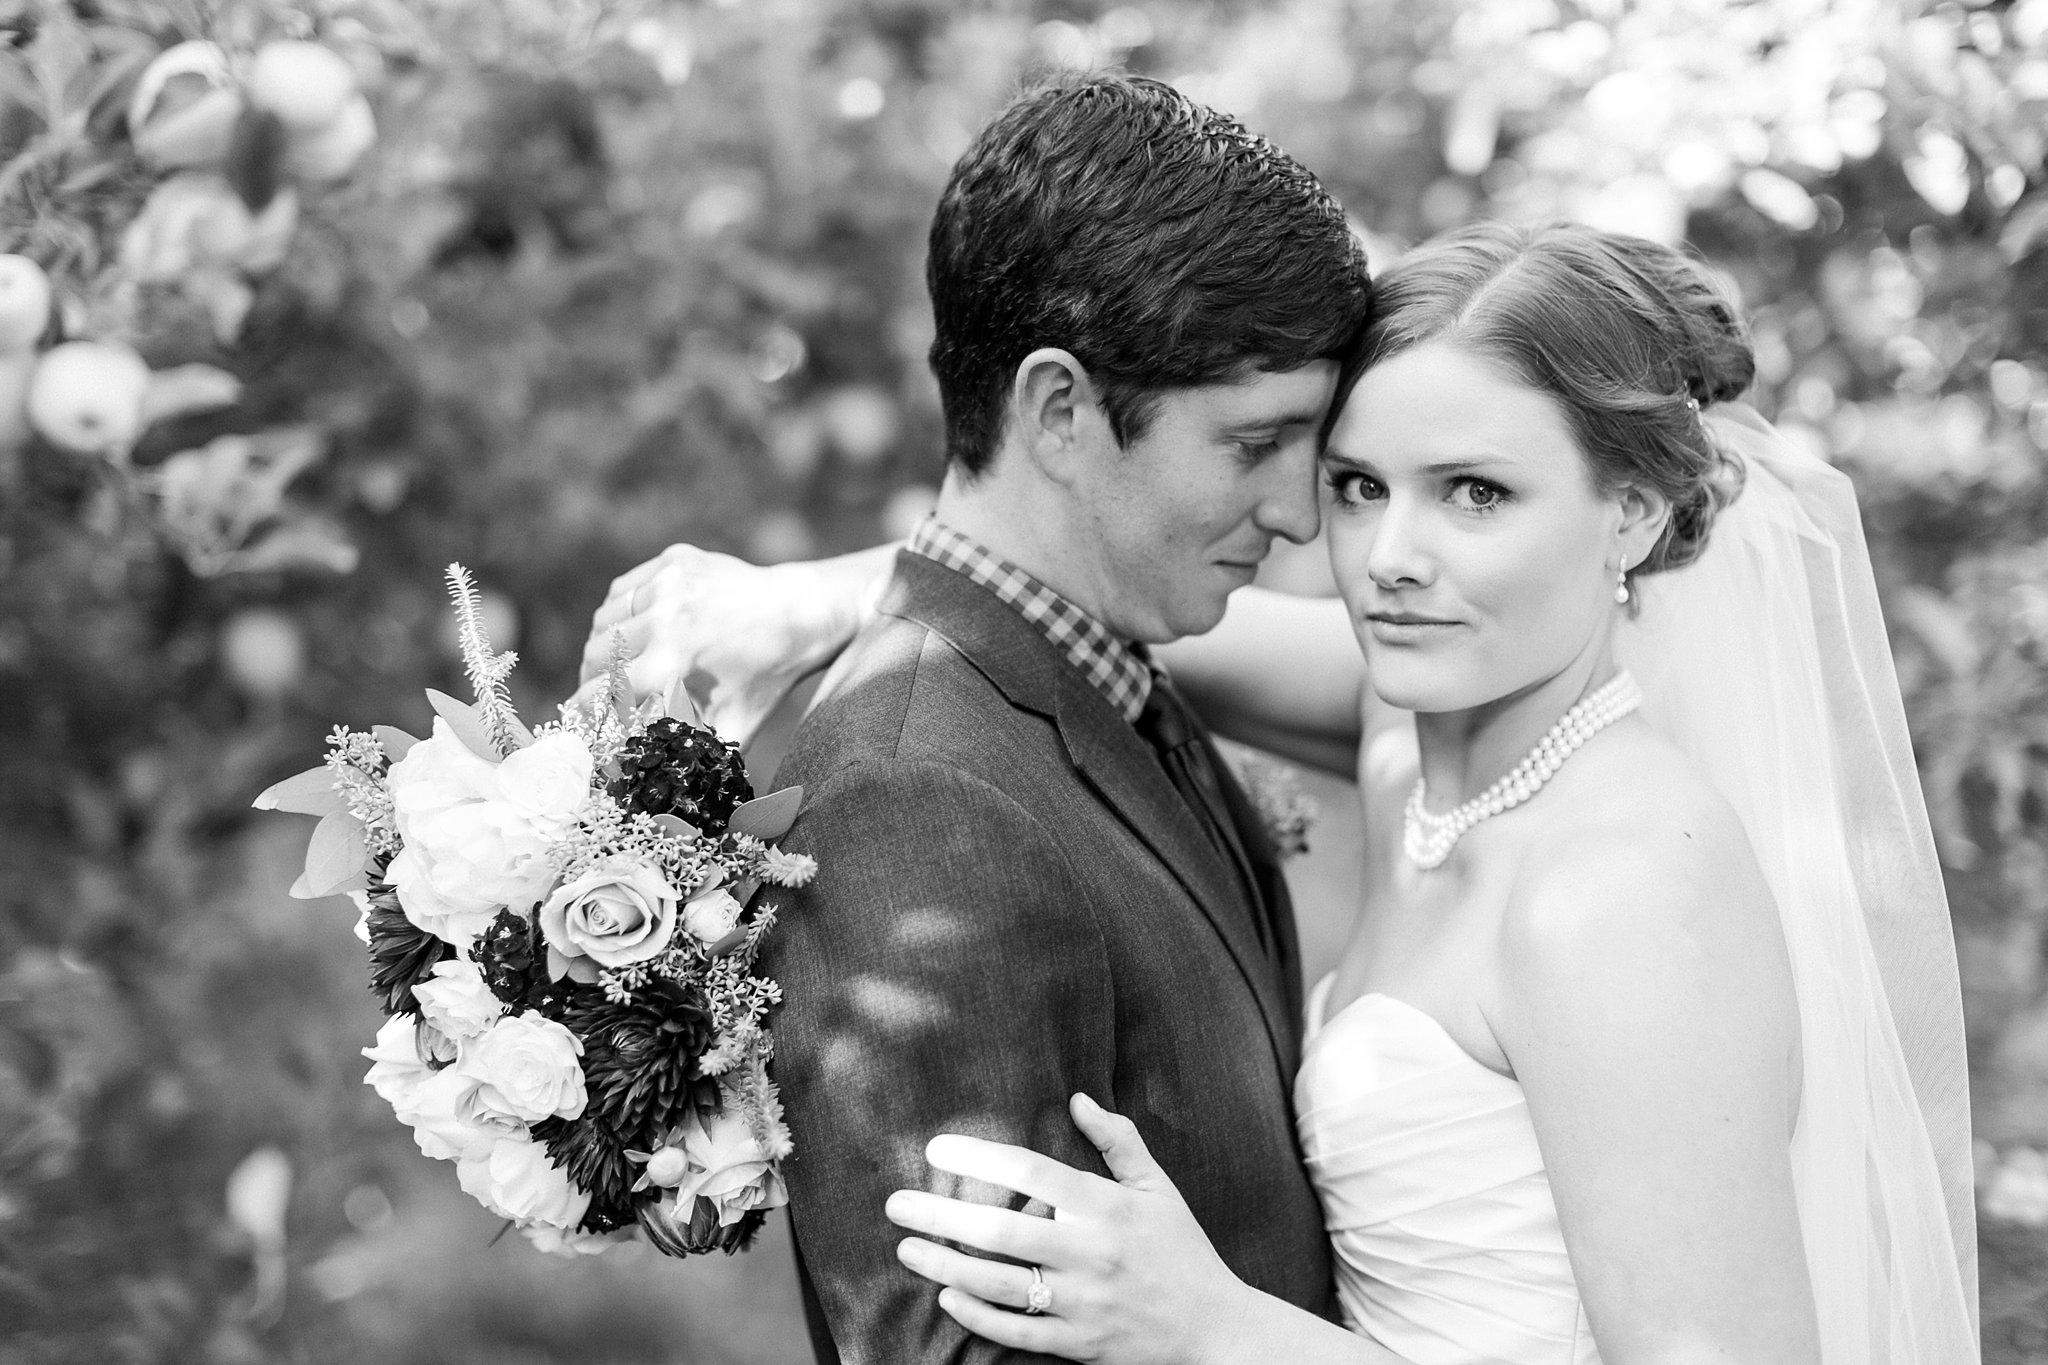 Chelan Washington Wedding Photos Megan Kelsey Photography Delight Wedding Workshop Styled Shoot Annalee & Scot-116.jpg